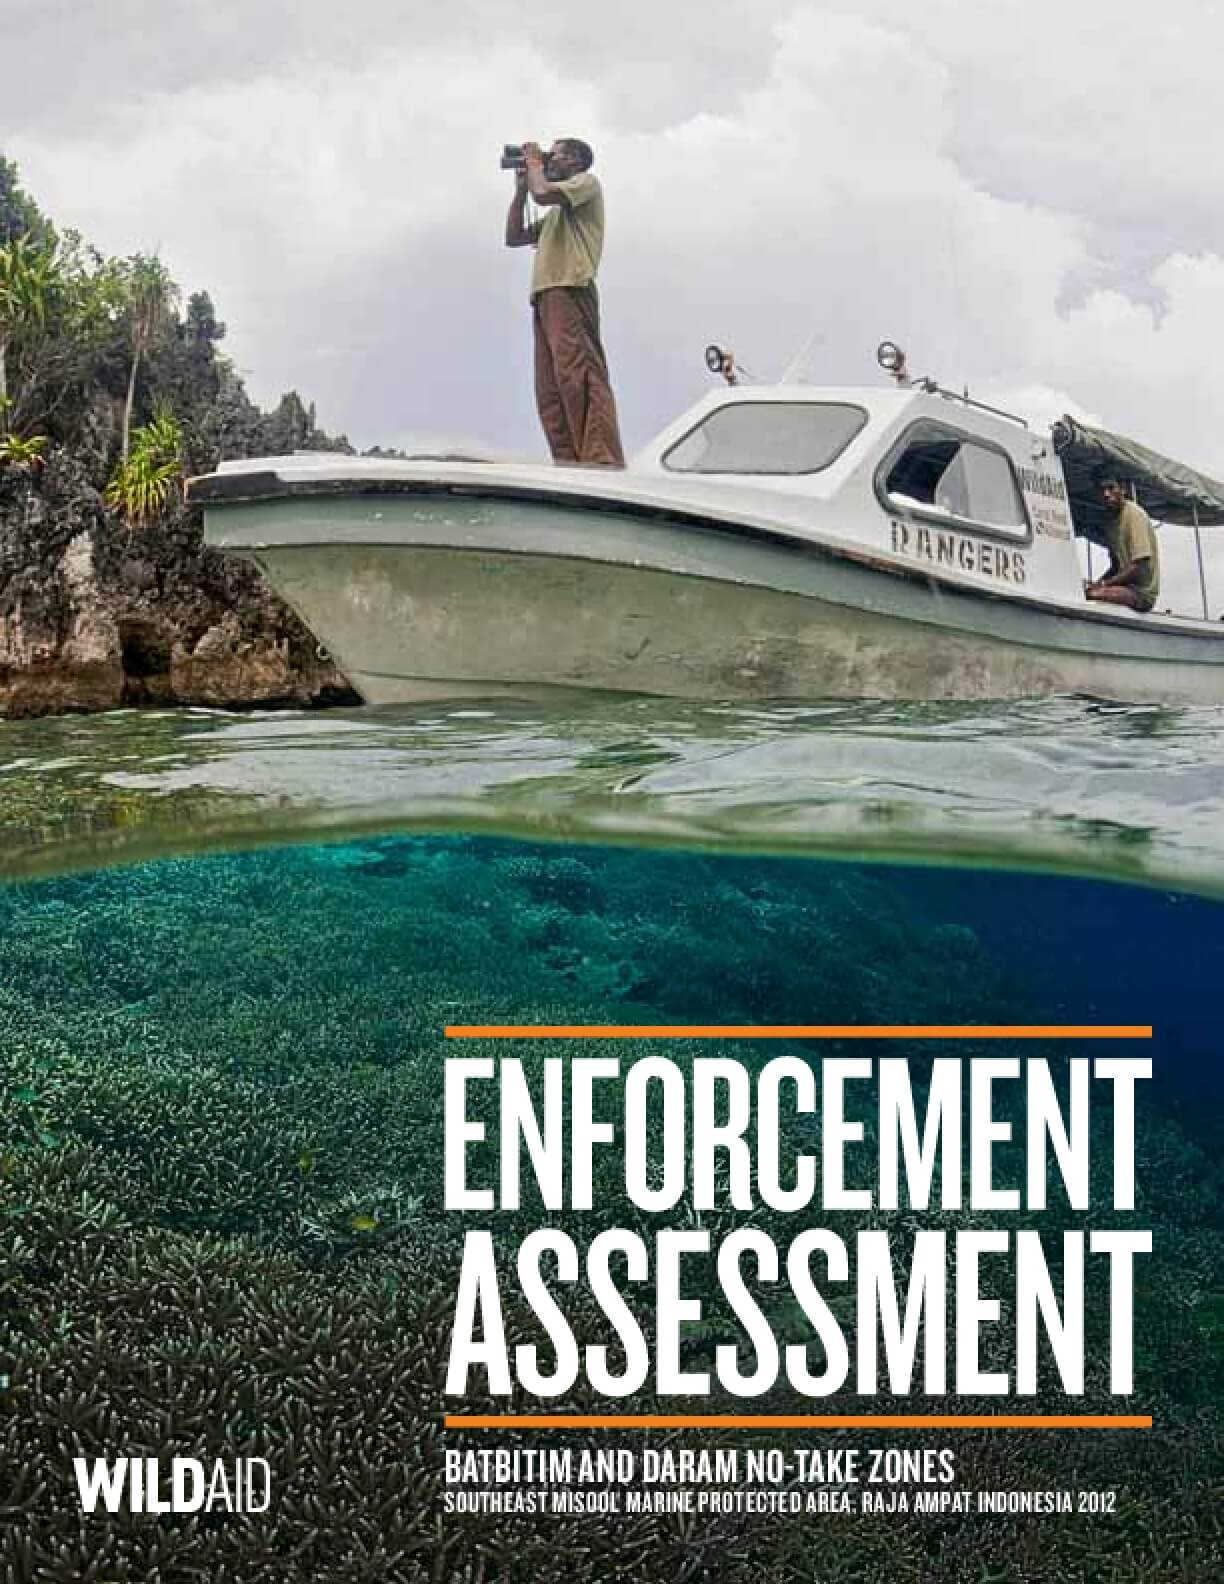 2012 Indonesia Marine Enforcement Report: Batbitim and Daram No-Take Zones. Southeast Misool Marine Protected Area, Raja Ampat Indonesia 2012